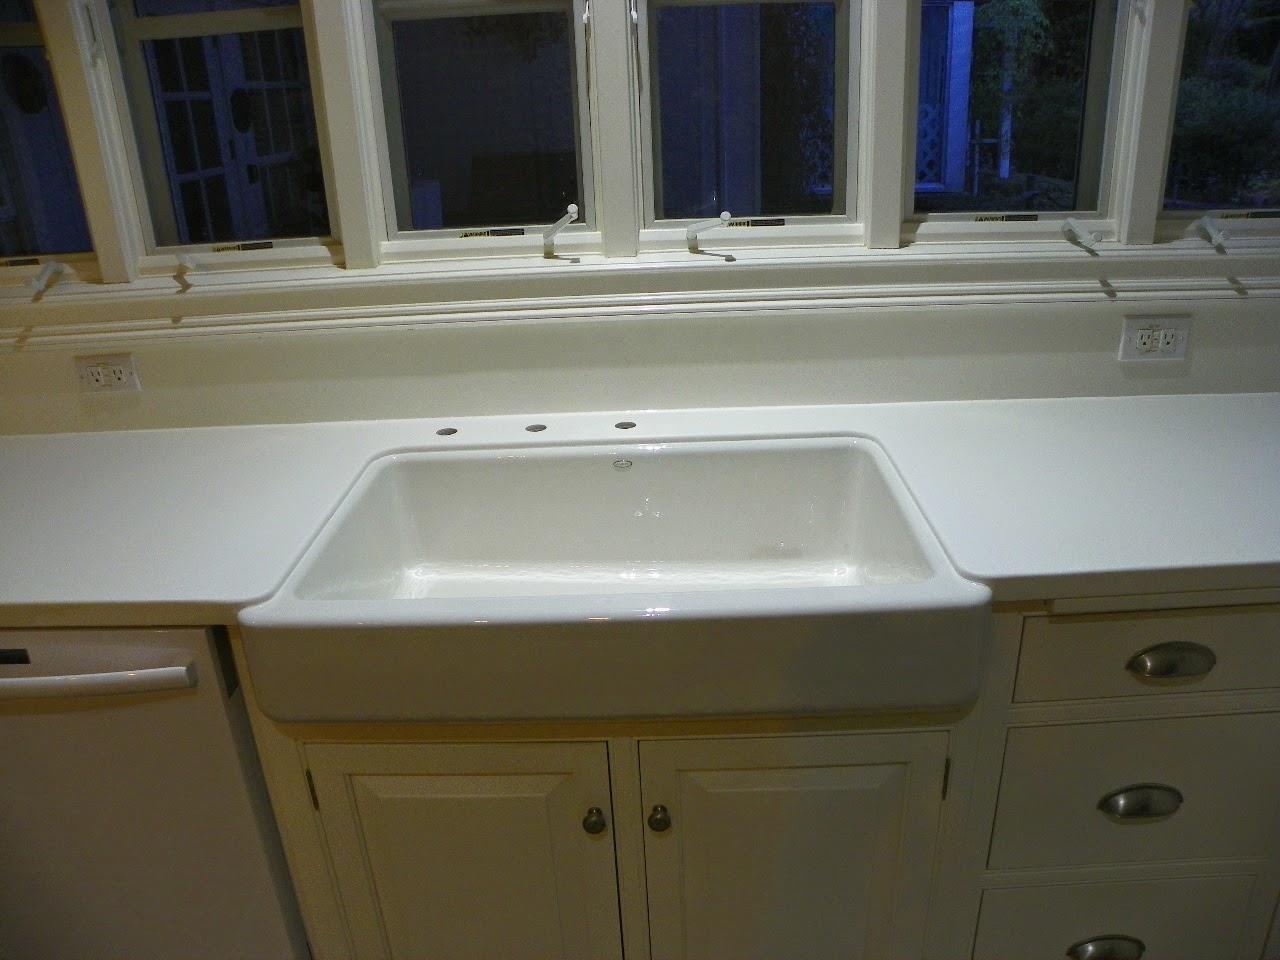 ... Blog: Retro Fit Undermount Farm Sink Installation in Pinehurst, NC